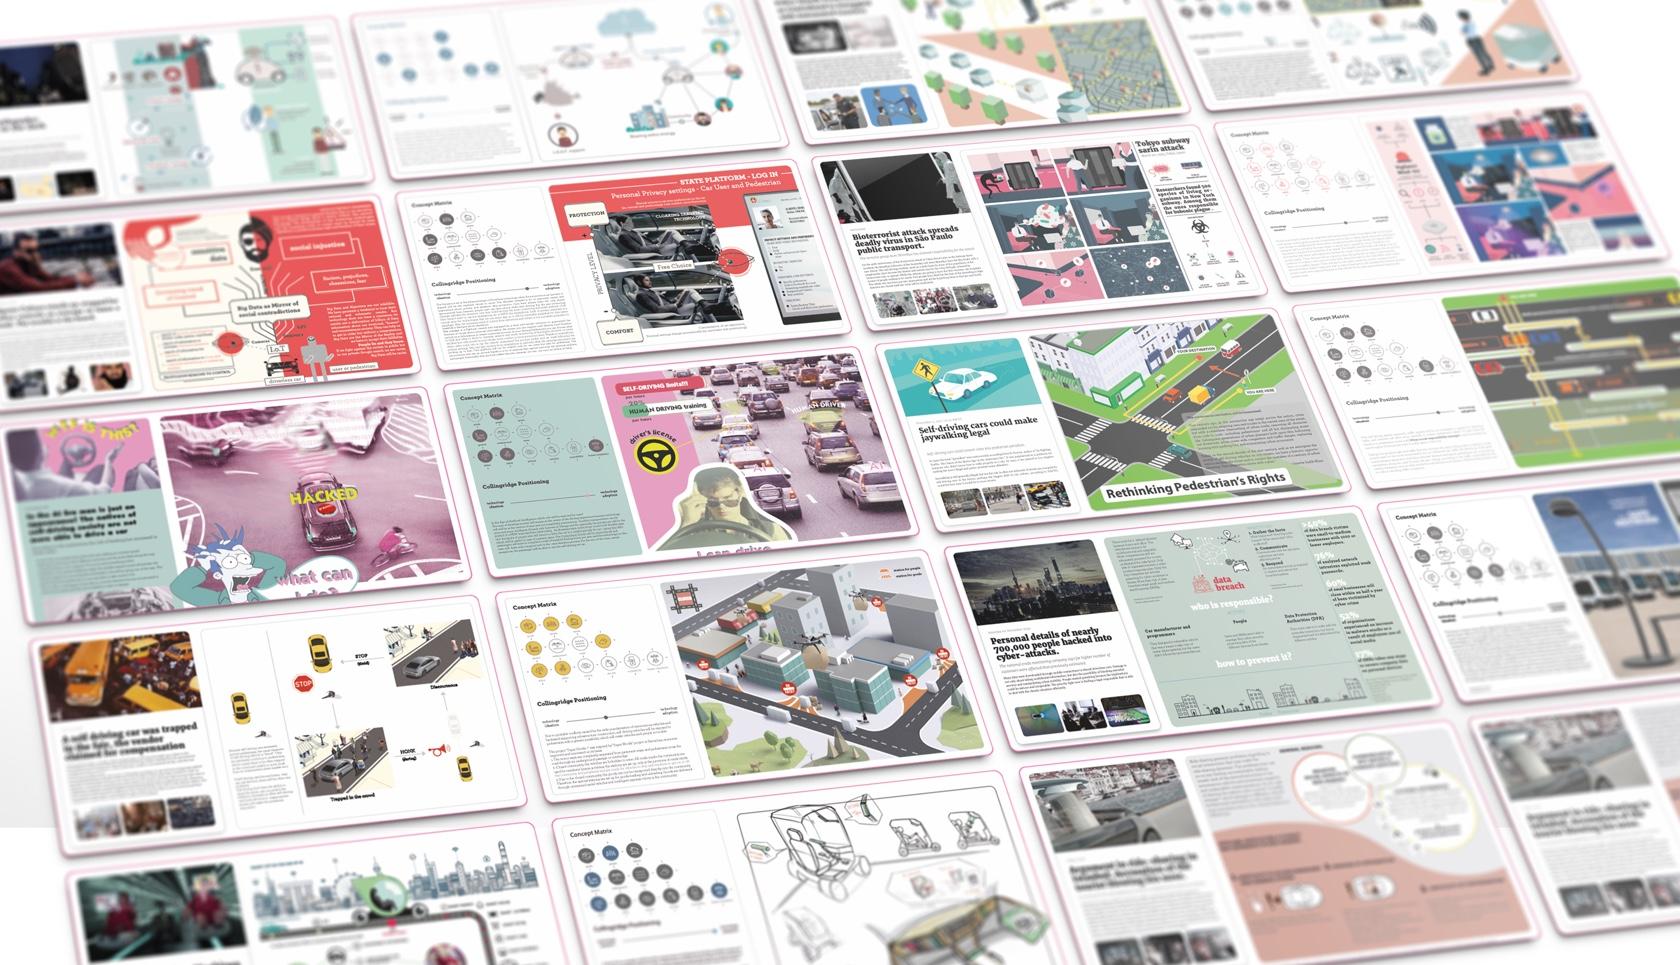 Self-Driving Society - Students Work - Fabio Besti Interdisciplinary Design